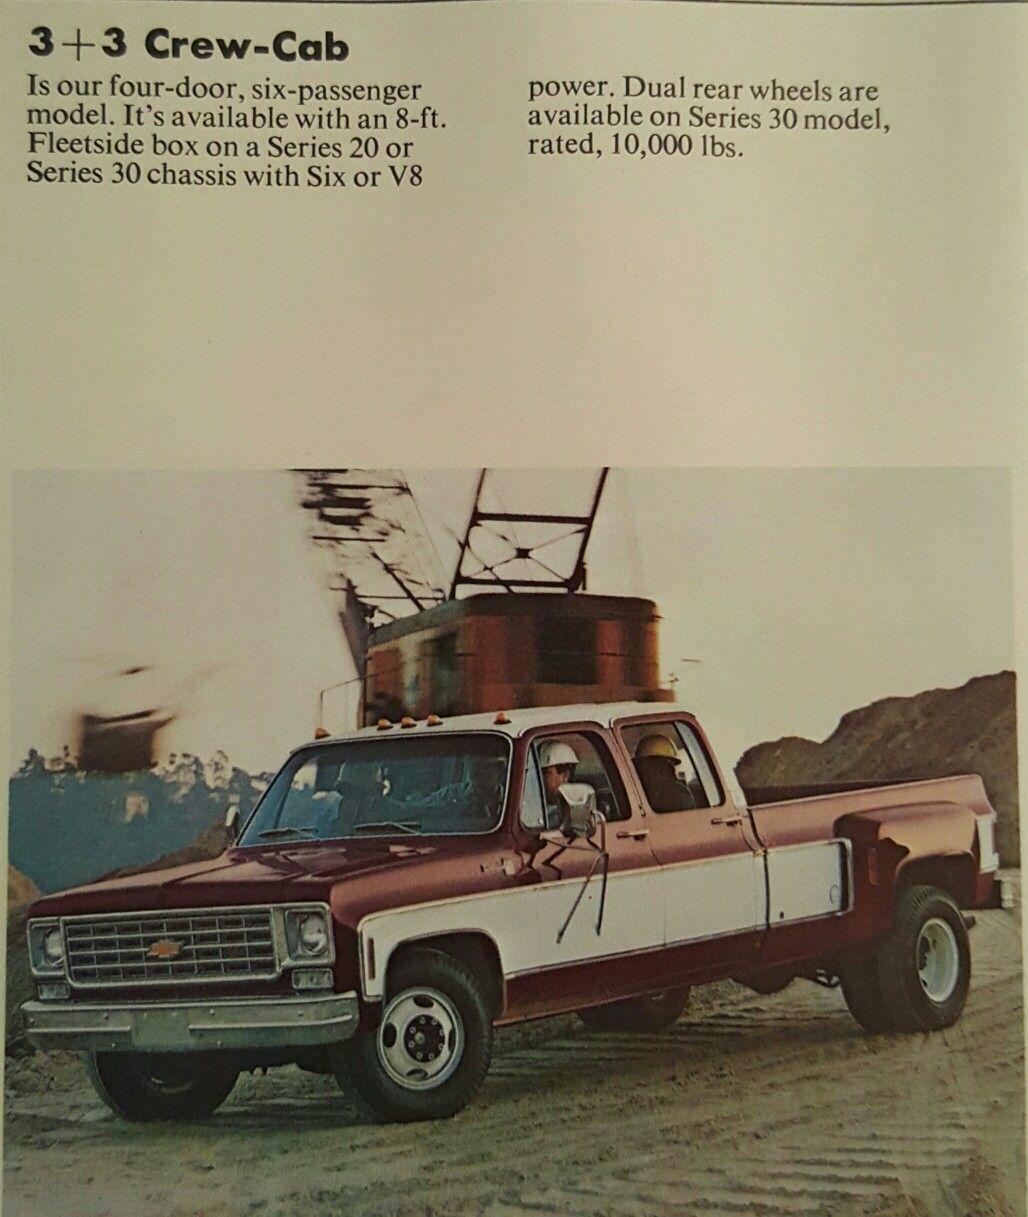 1980 Chevy Truck Van 1080 Wiring Diagrams Original Manual Factory 1976 Chevrolet G20 Diagram 1975 C30 3 Crew Cab Pickup Trucks Rh Pinterest Com